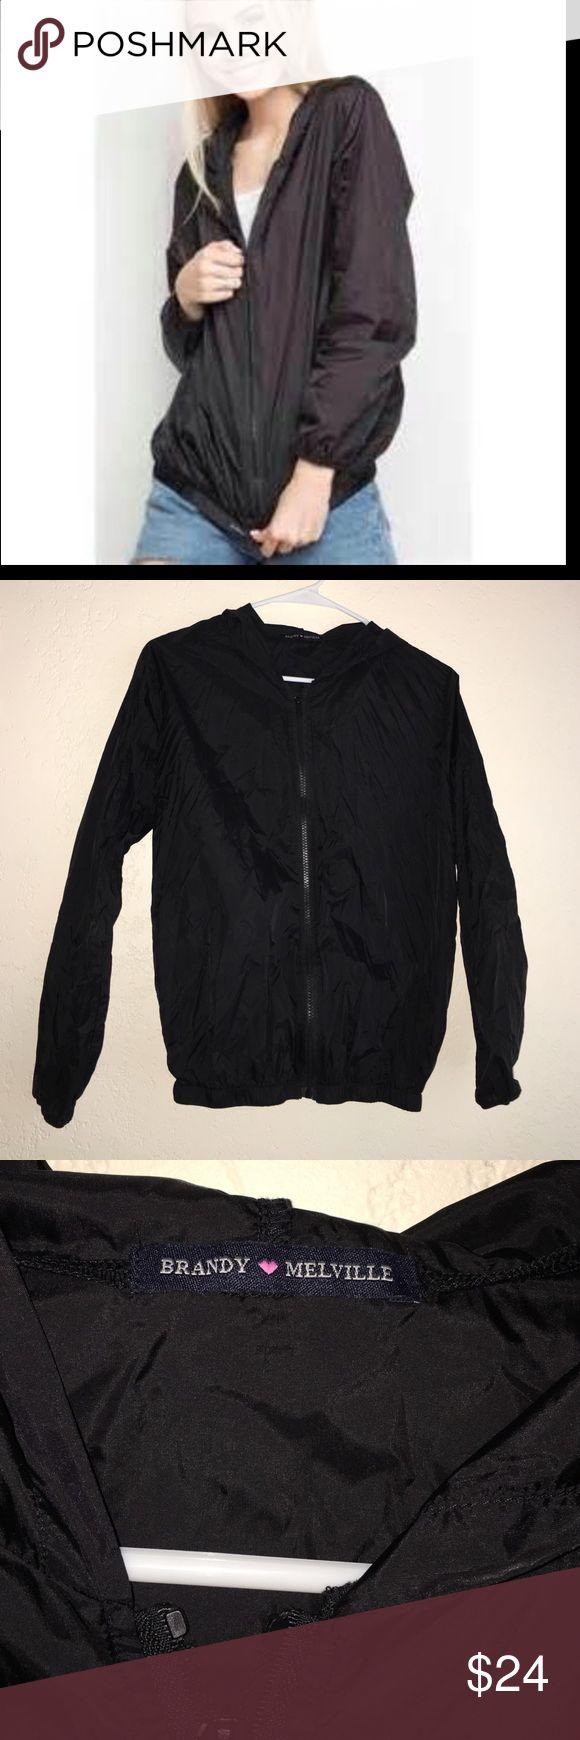 Brandy Melville windbreaker Brandy Melville thin black windbreaker (great condition, only worn a few times) it has NO pockets Brandy Melville Jackets & Coats